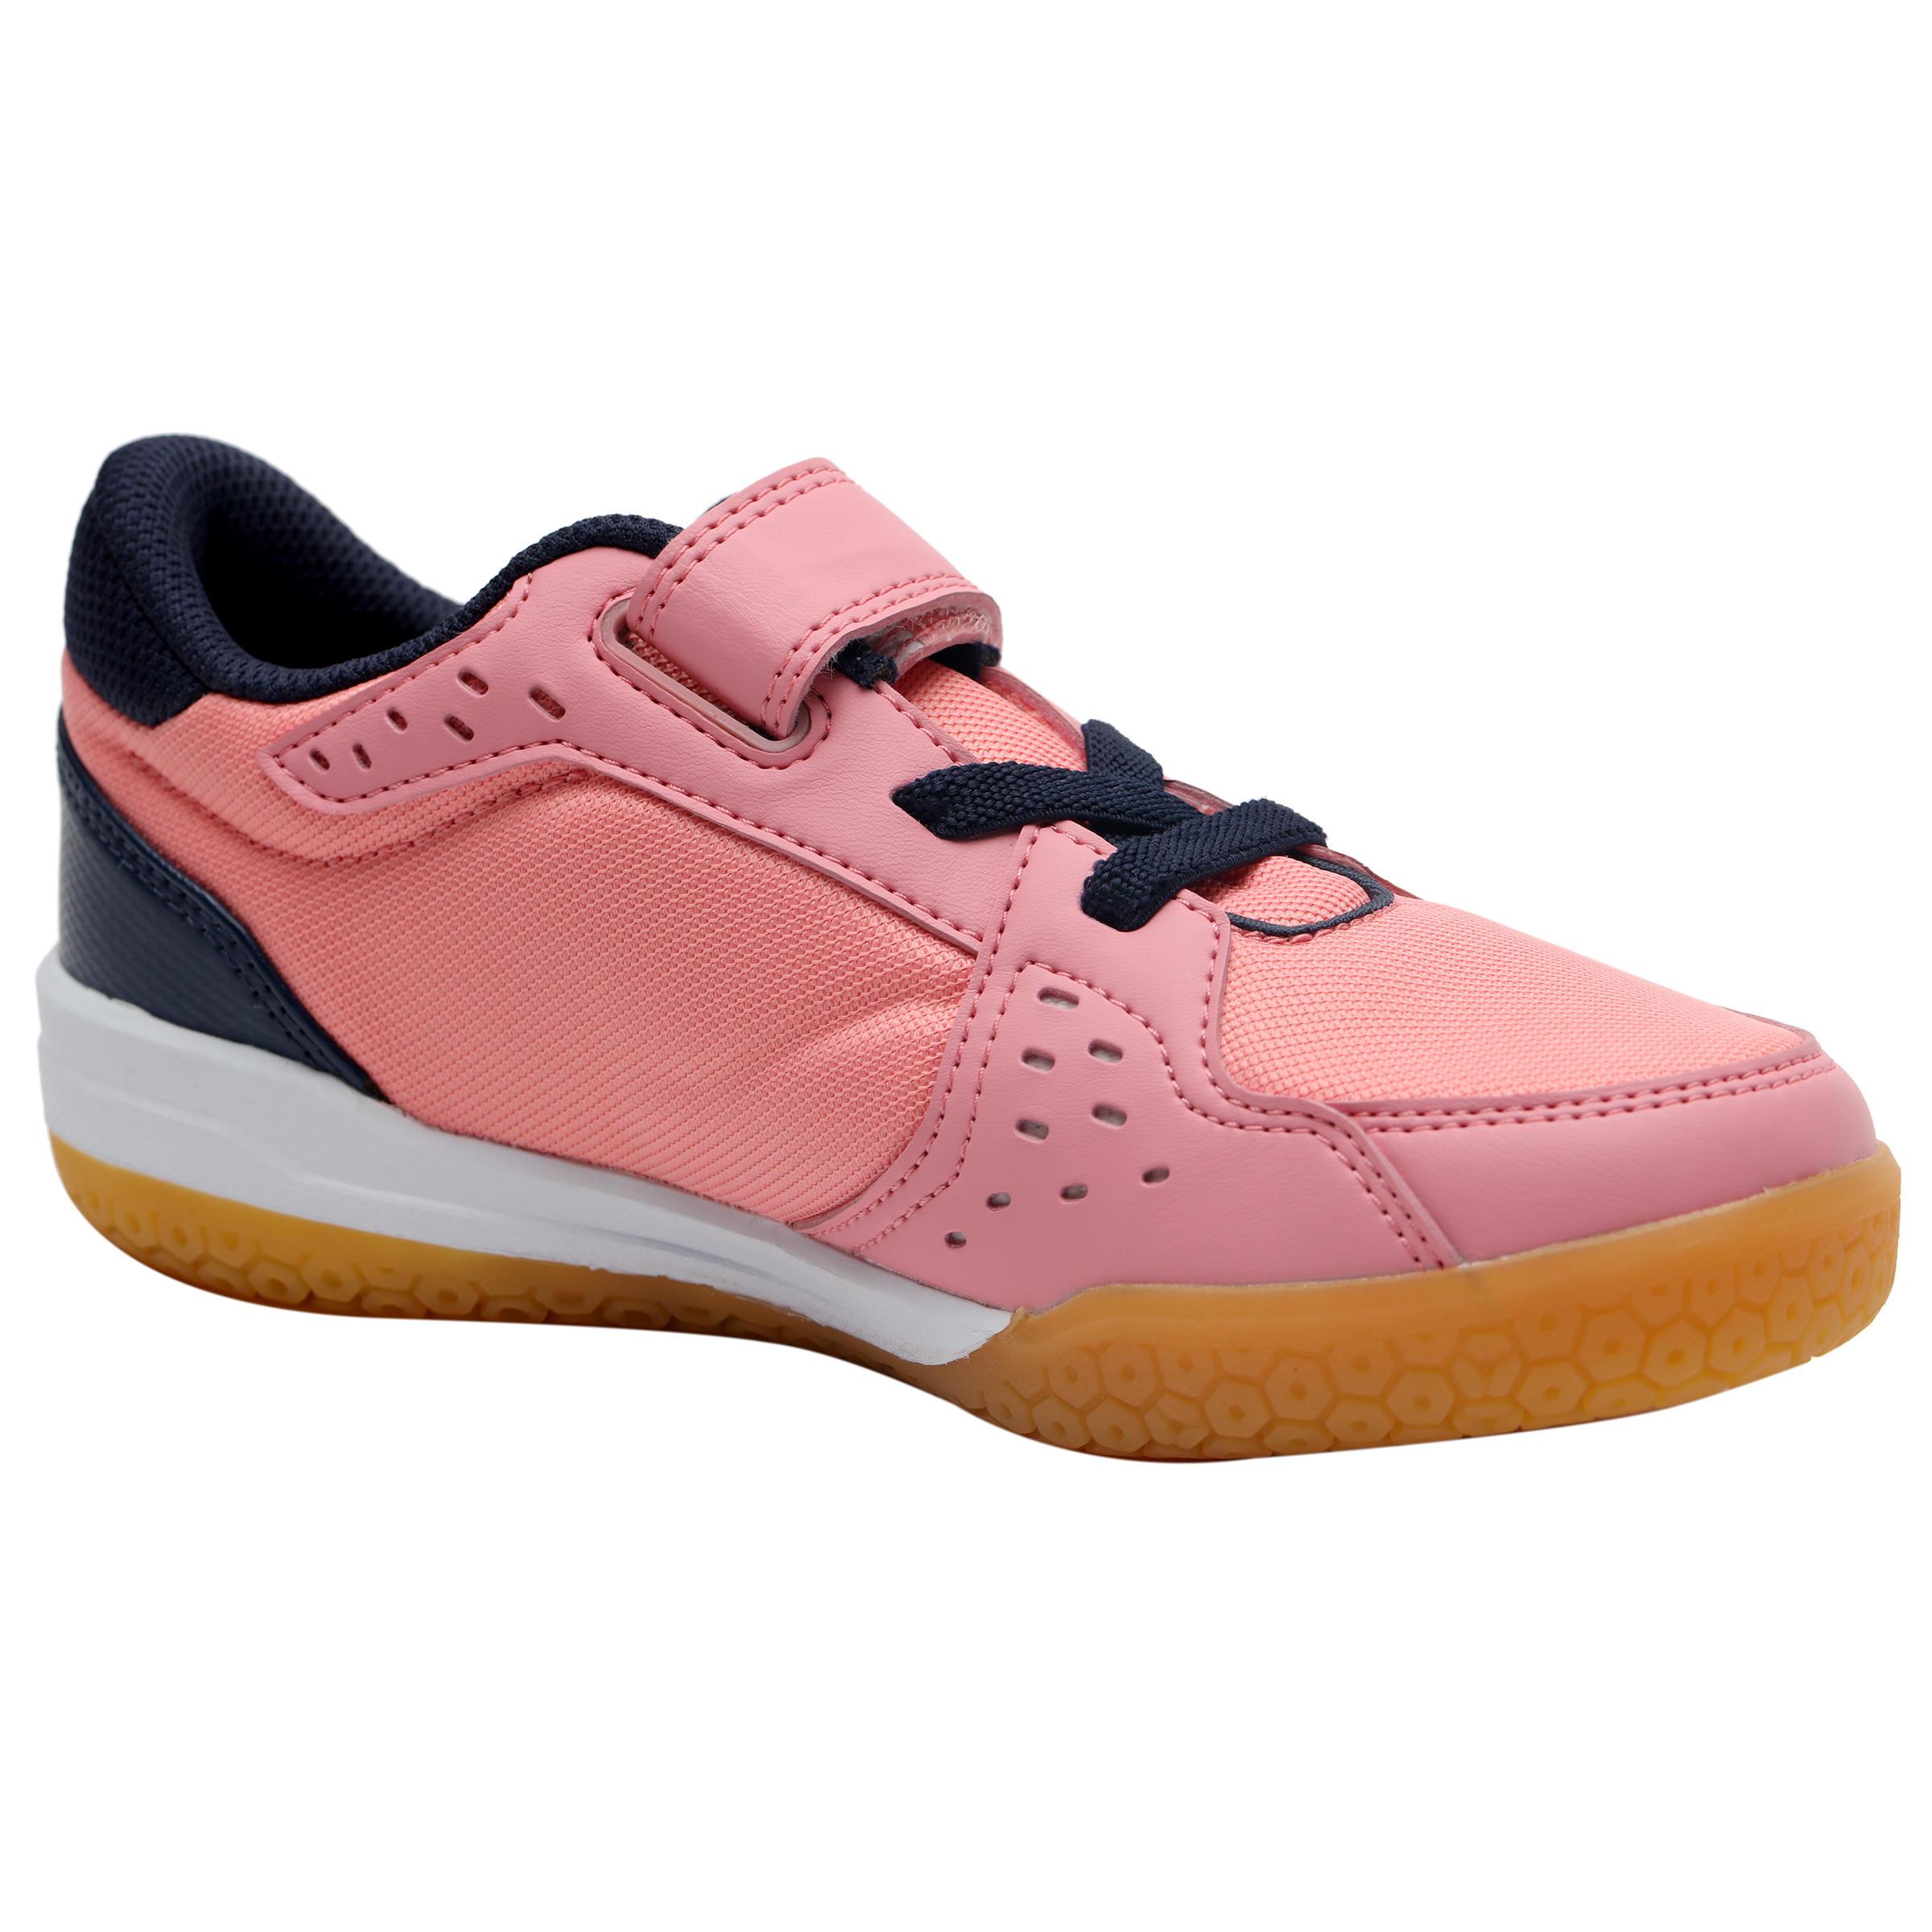 BS730 JR Kids' Badminton Shoes - Pink